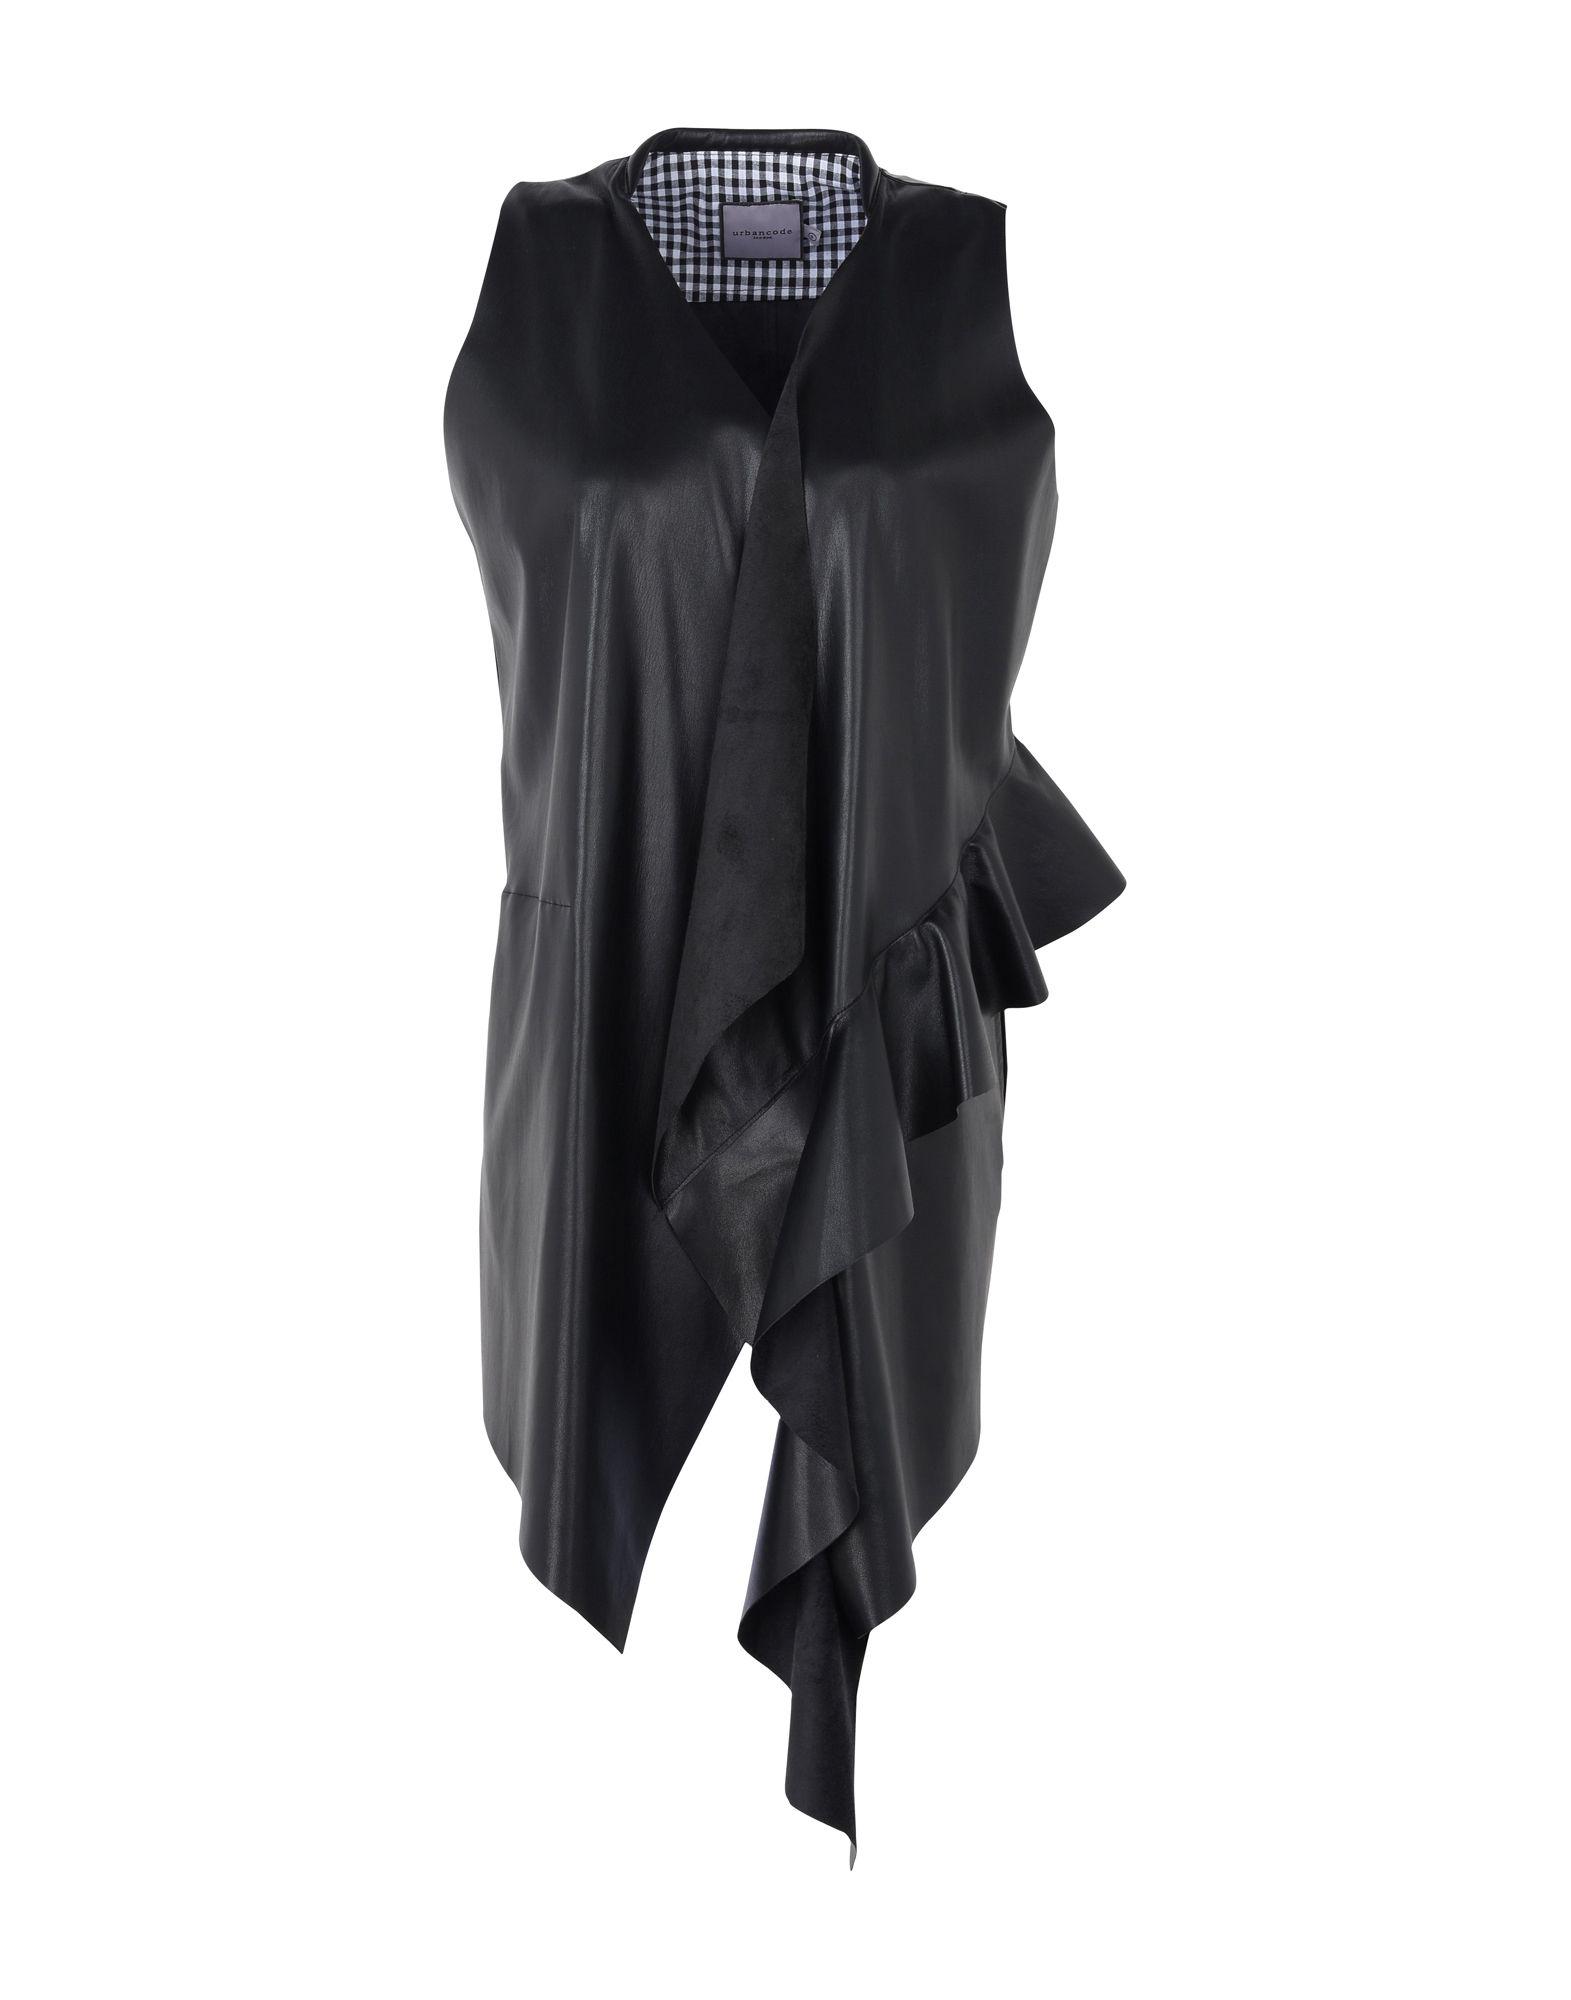 URBANCODE Blazers in Black